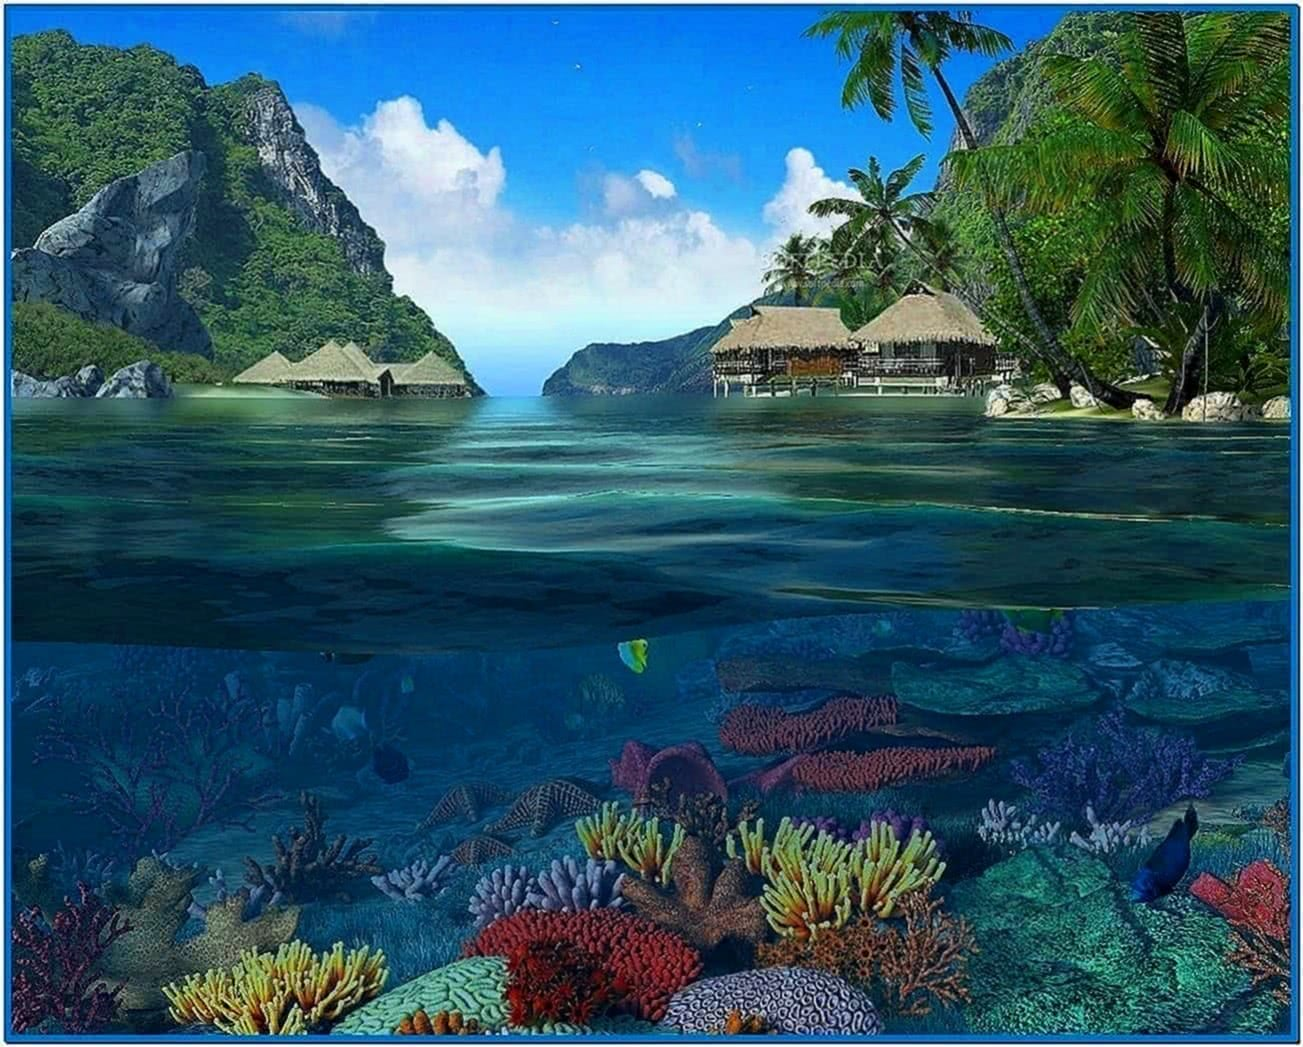 Caribbean Islands 3D Screensaver